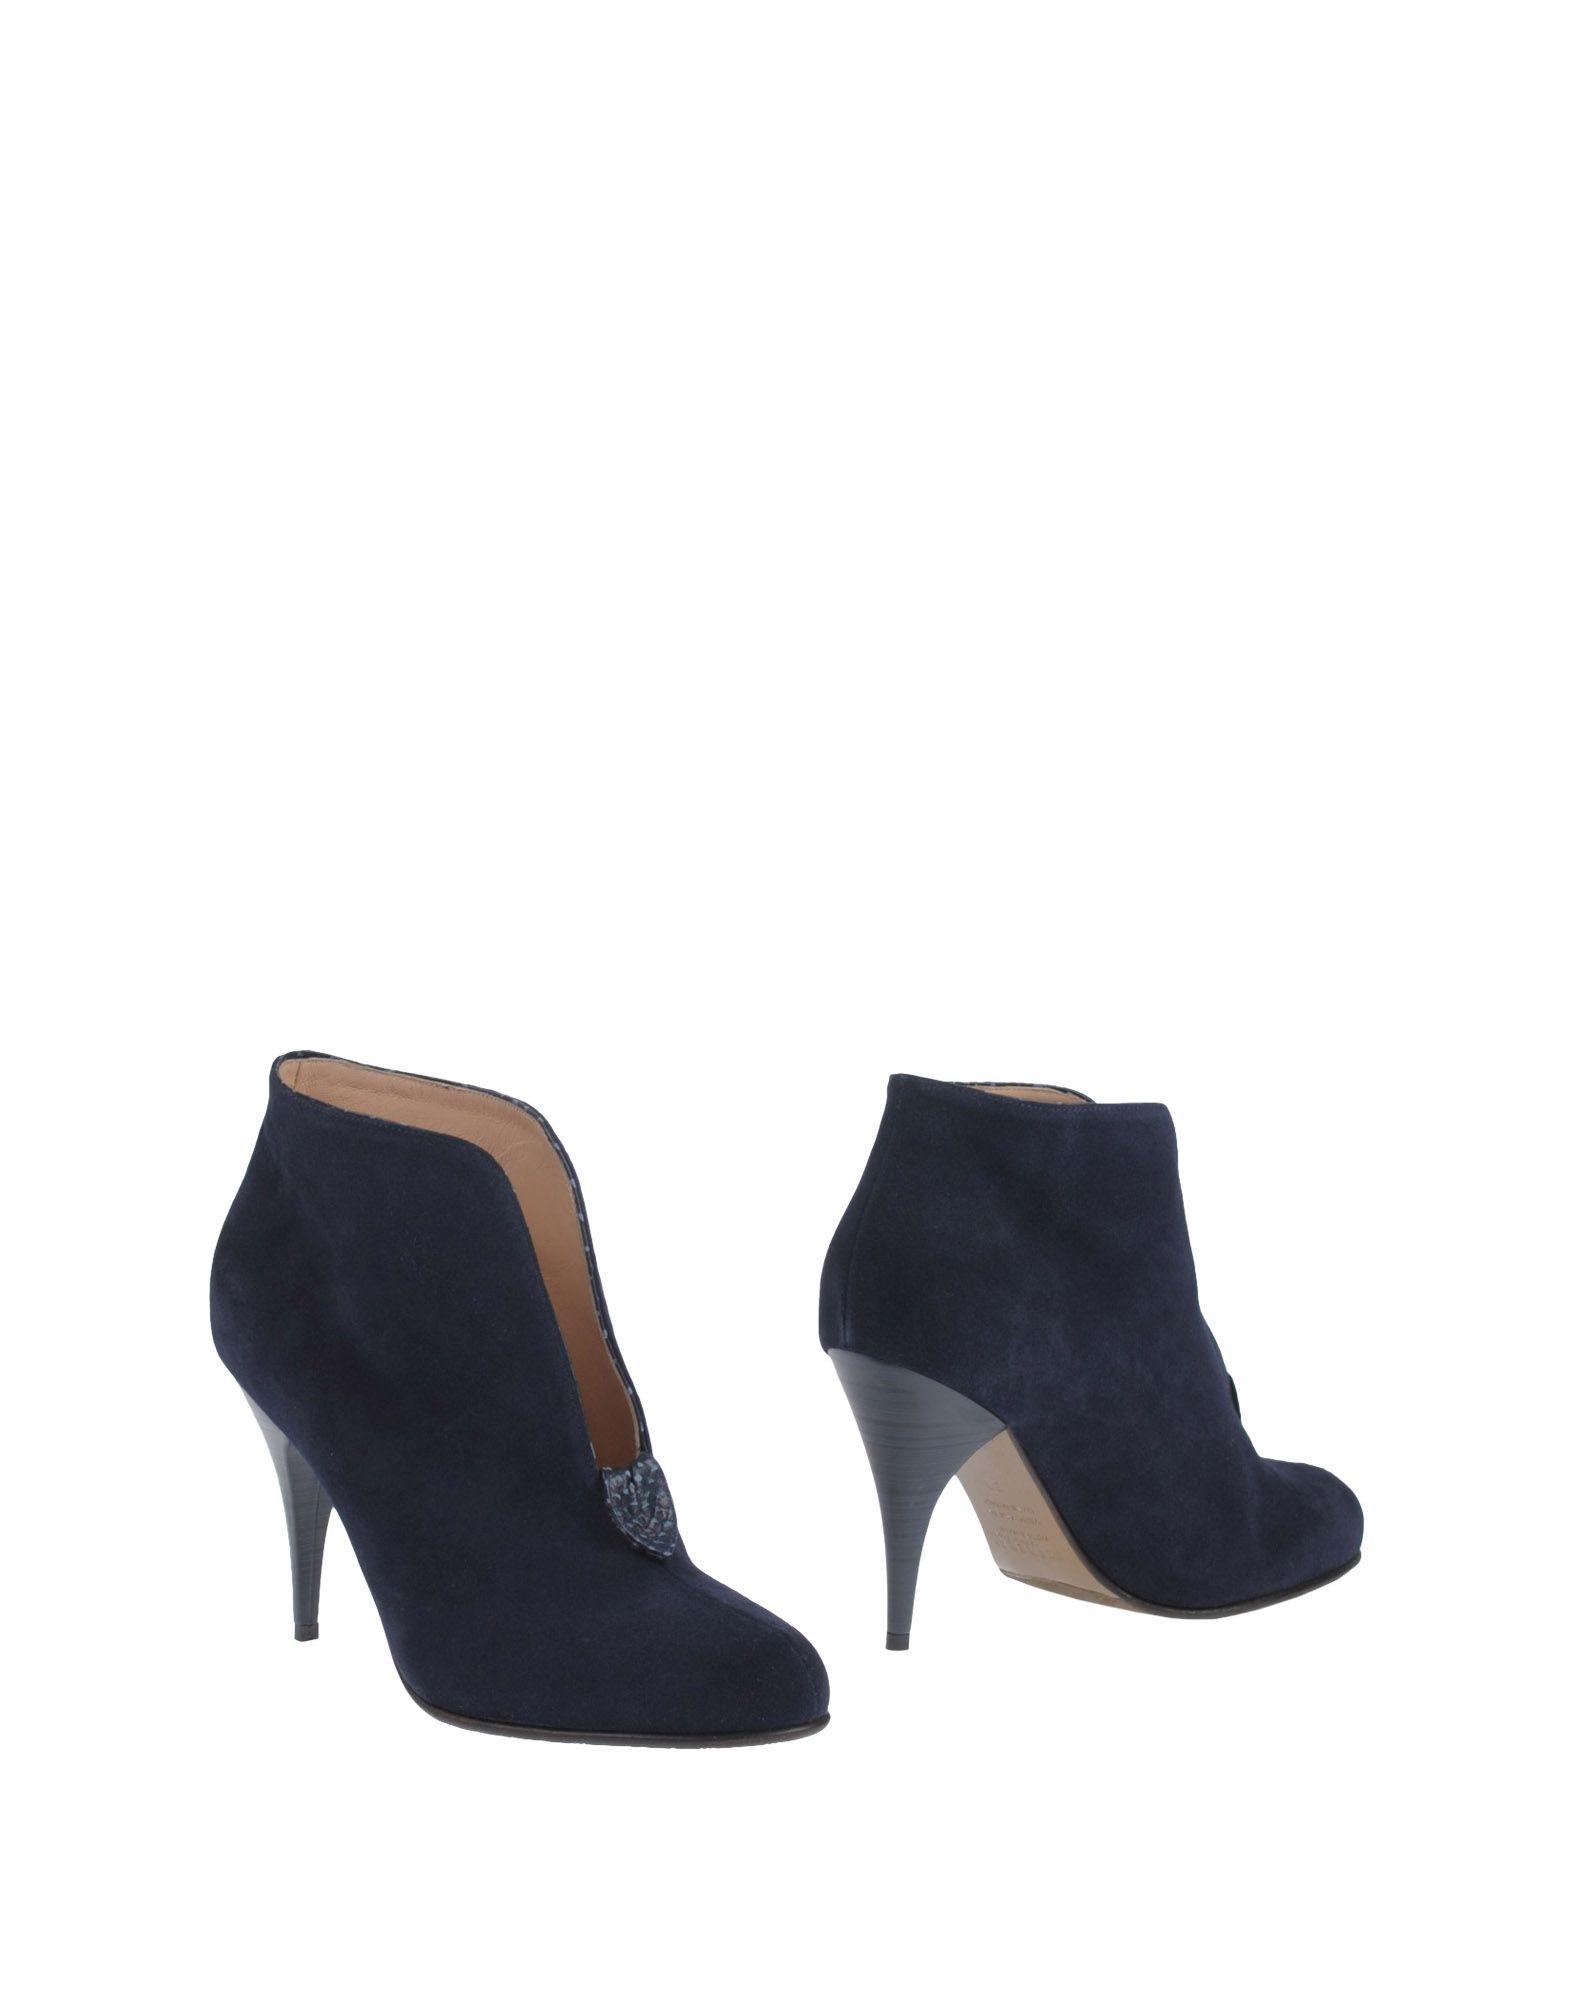 Dibrera By Paolo Zanoli Stiefelette Damen  11445457XUGut aussehende strapazierfähige Schuhe